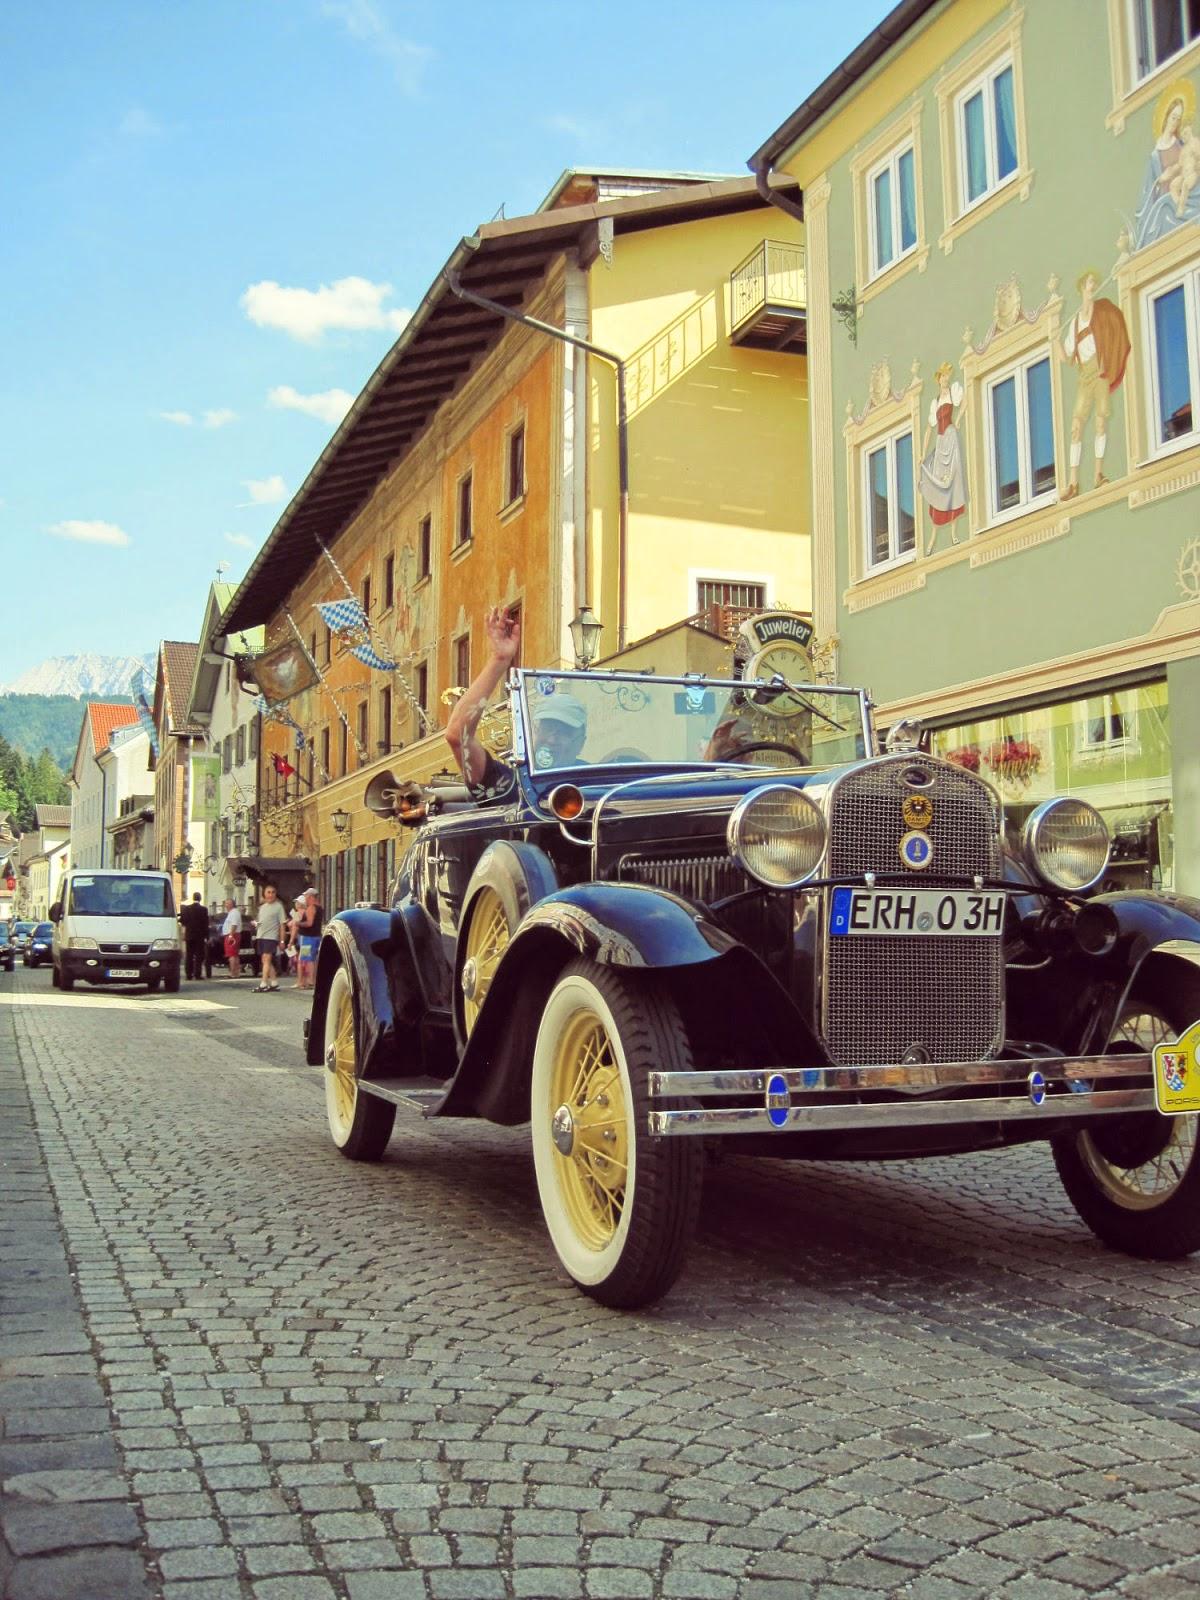 Streets of Garmisch-Partenkirchen